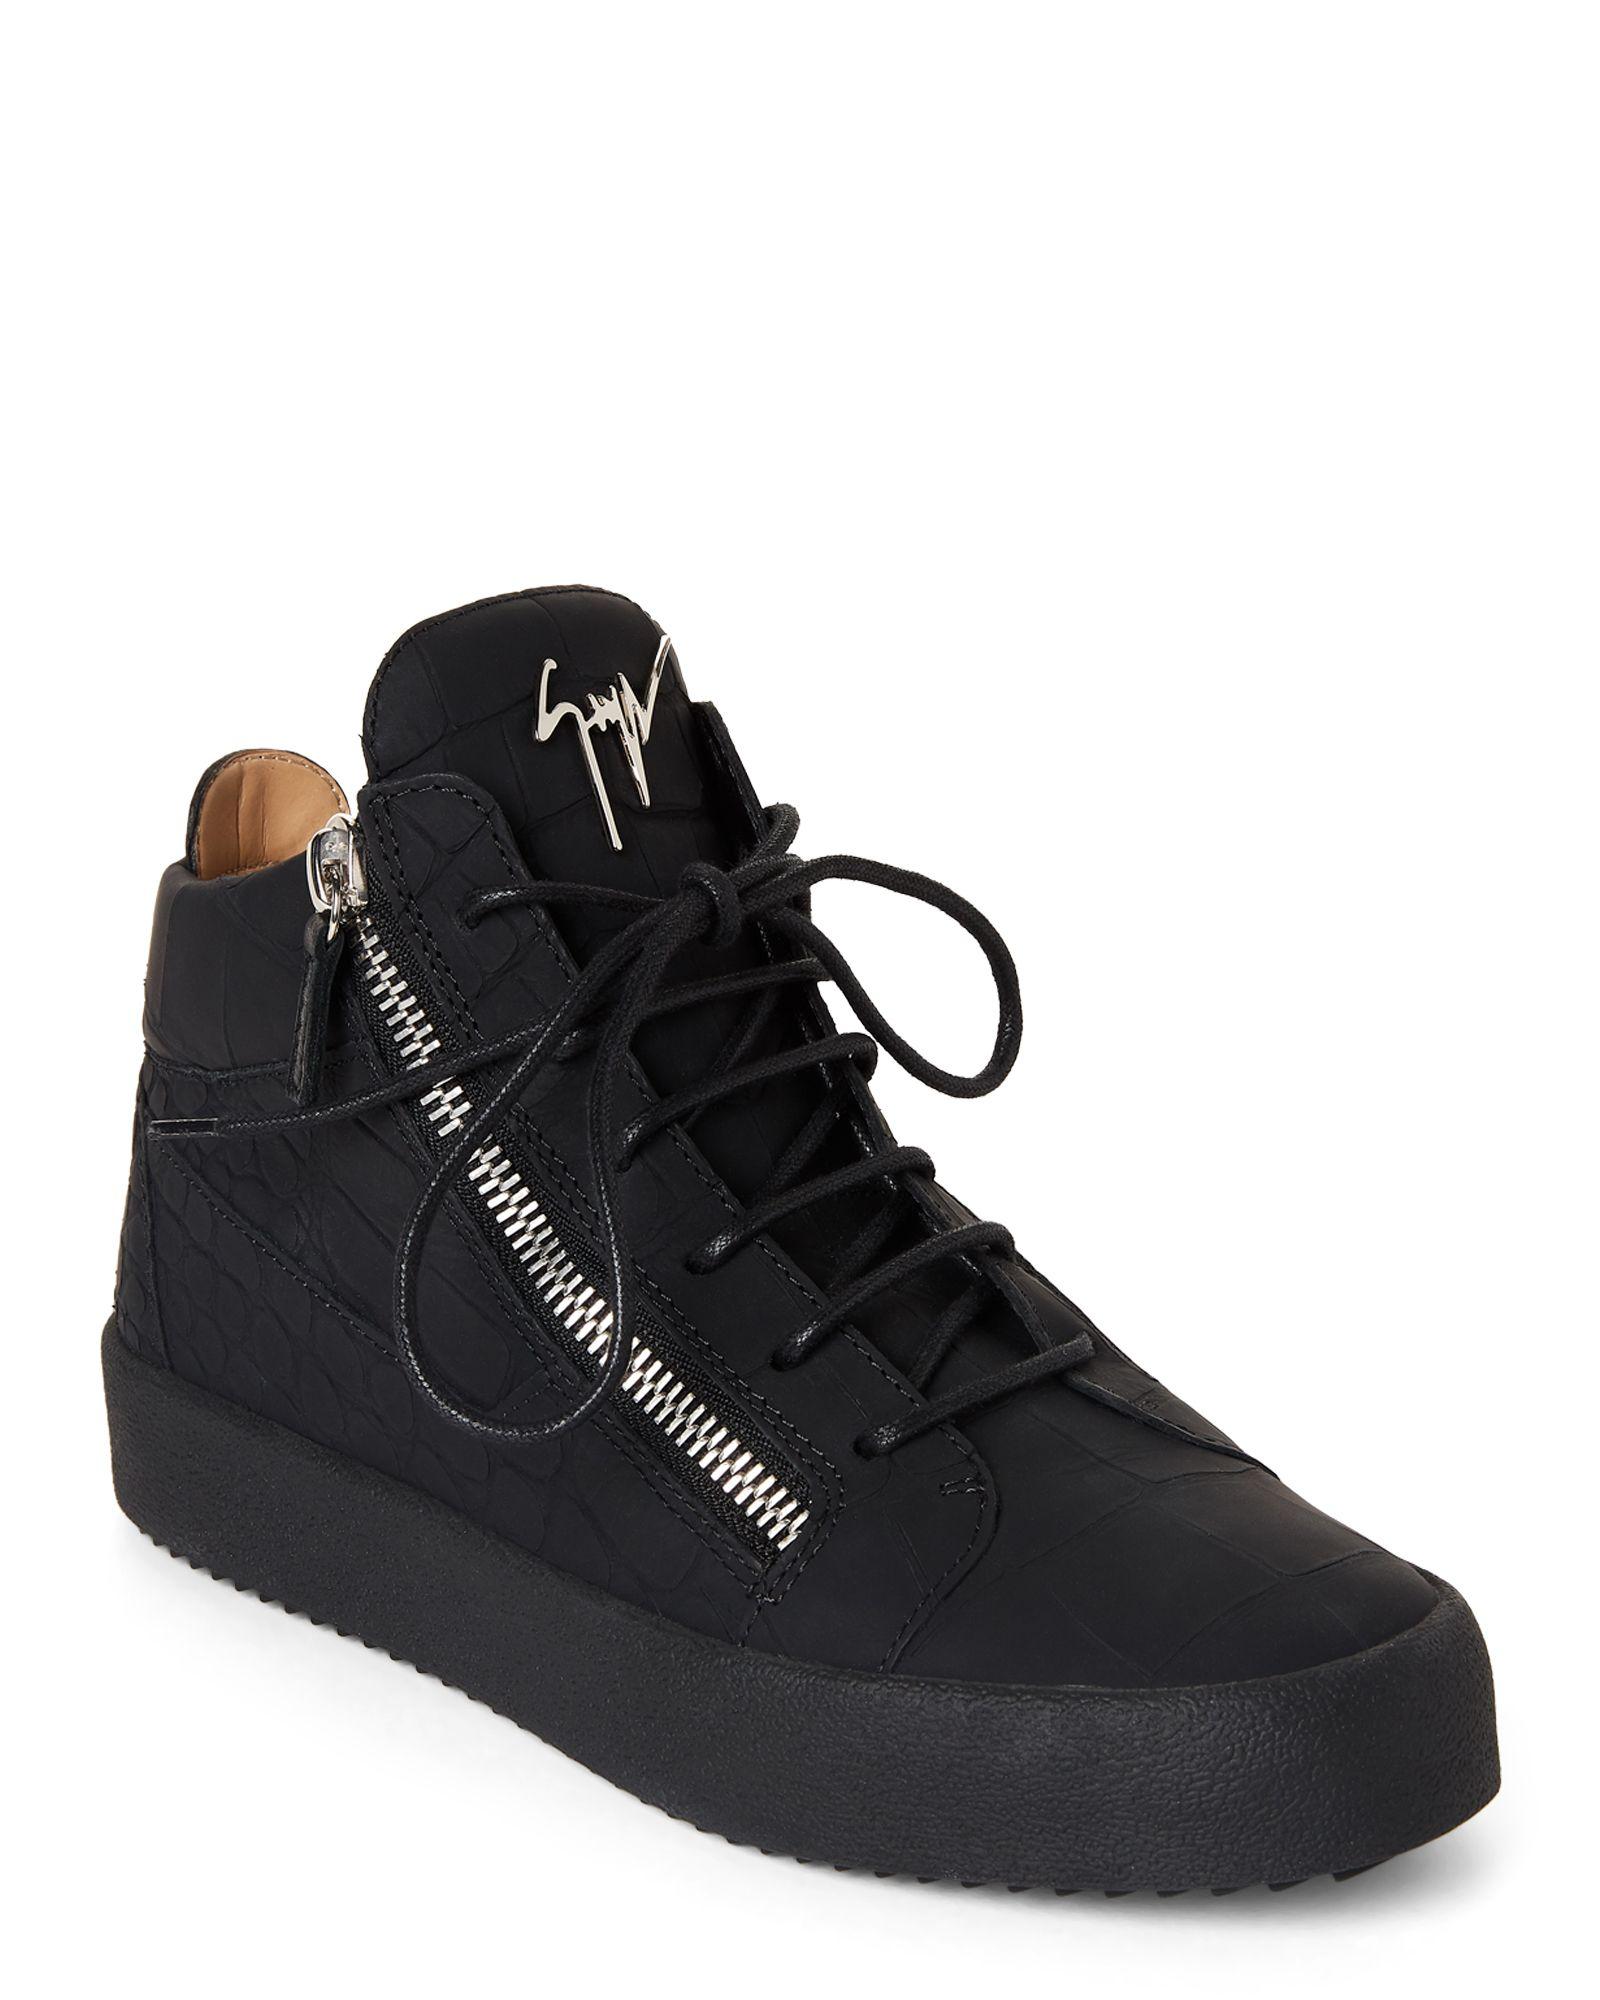 Giuseppe Zanotti Design Black May London Sombry High Top Sneakers Top Sneakers Sneakers High Top Sneakers